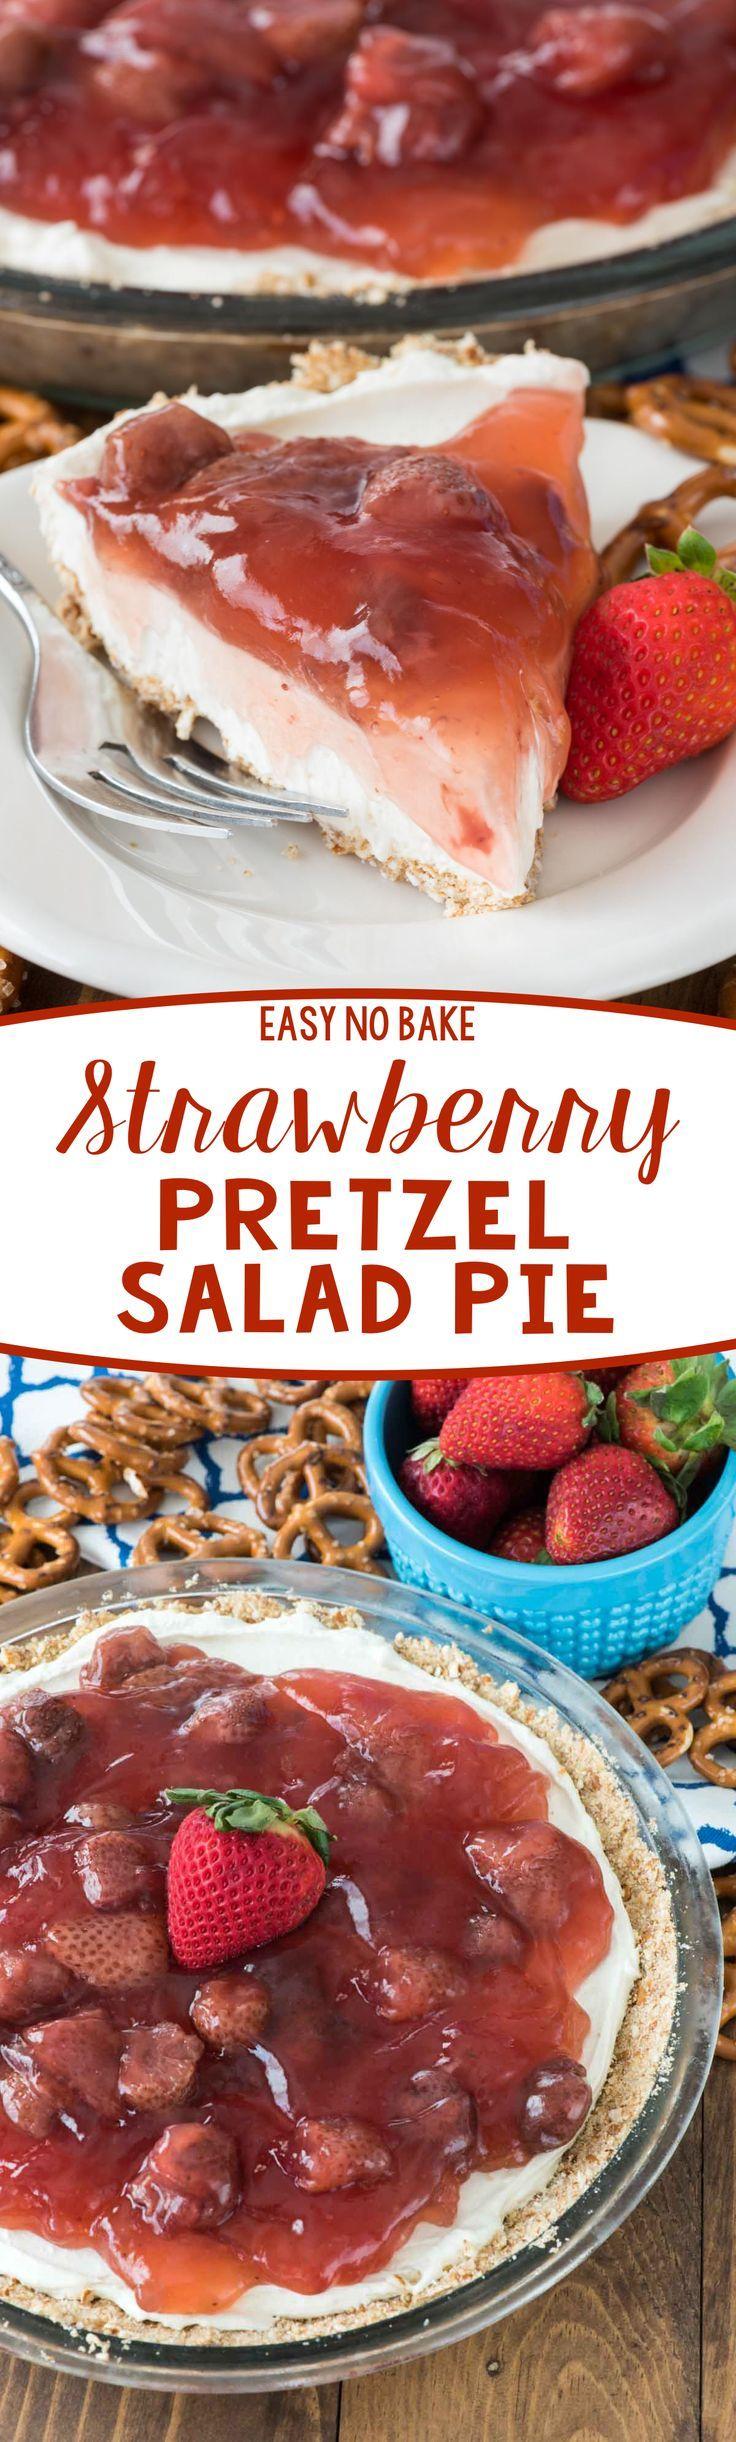 No Bake Strawberry Pretzel Salad Pie - this easy recipe has a pretzel crust, creamy cheesecake filling, and strawberry pie filling on top! It's great for a summer party!